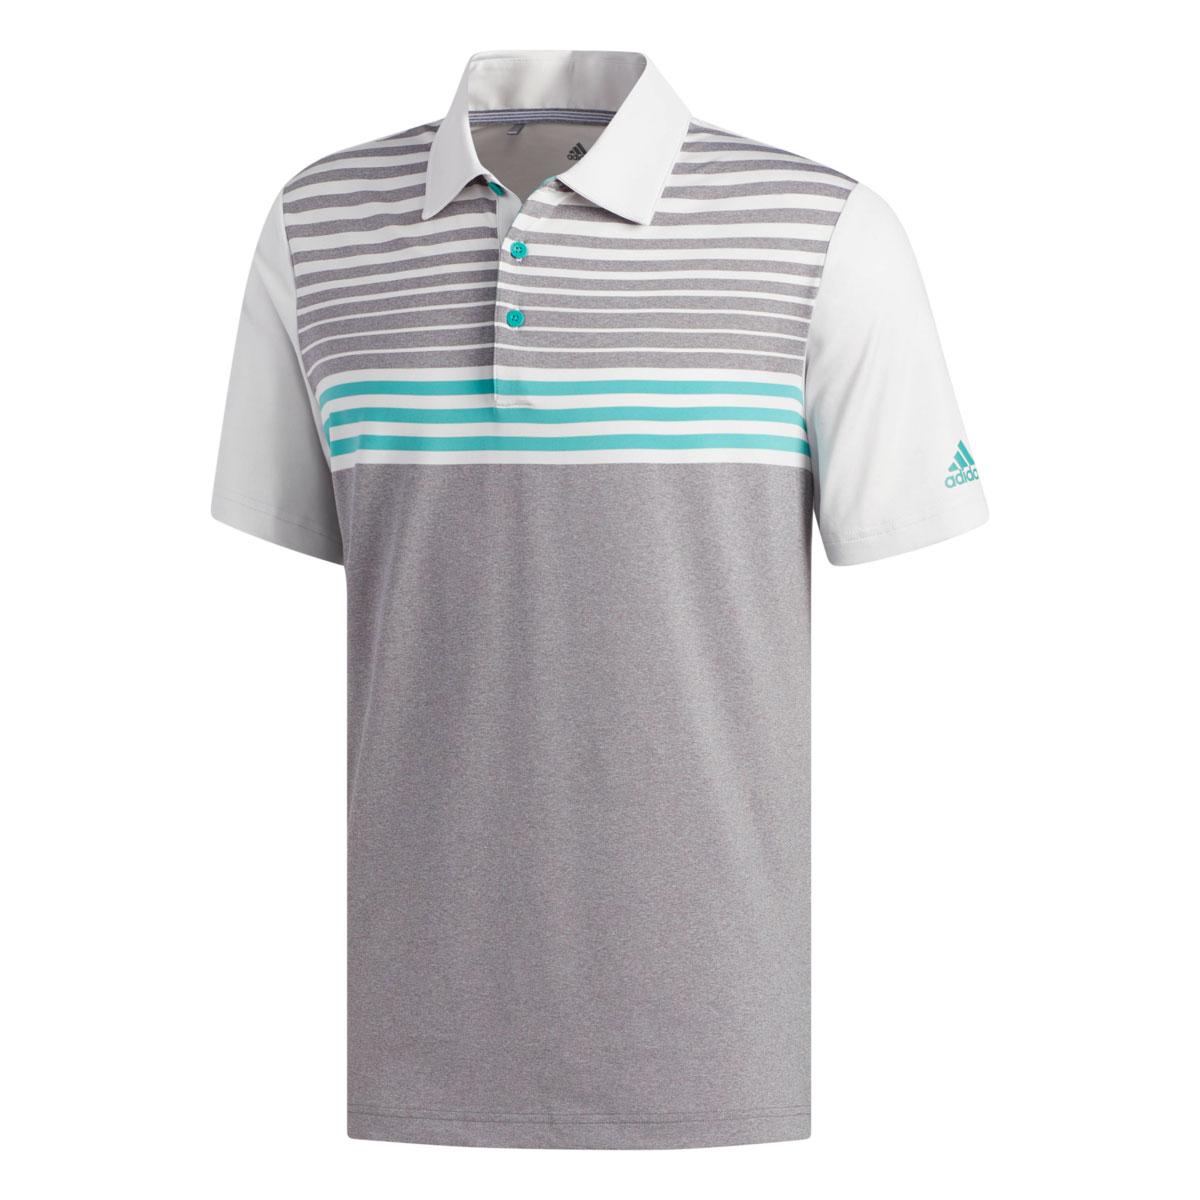 Adidas Ultimate 3-Stripe Heather Gradient Grey/White/Green Polo